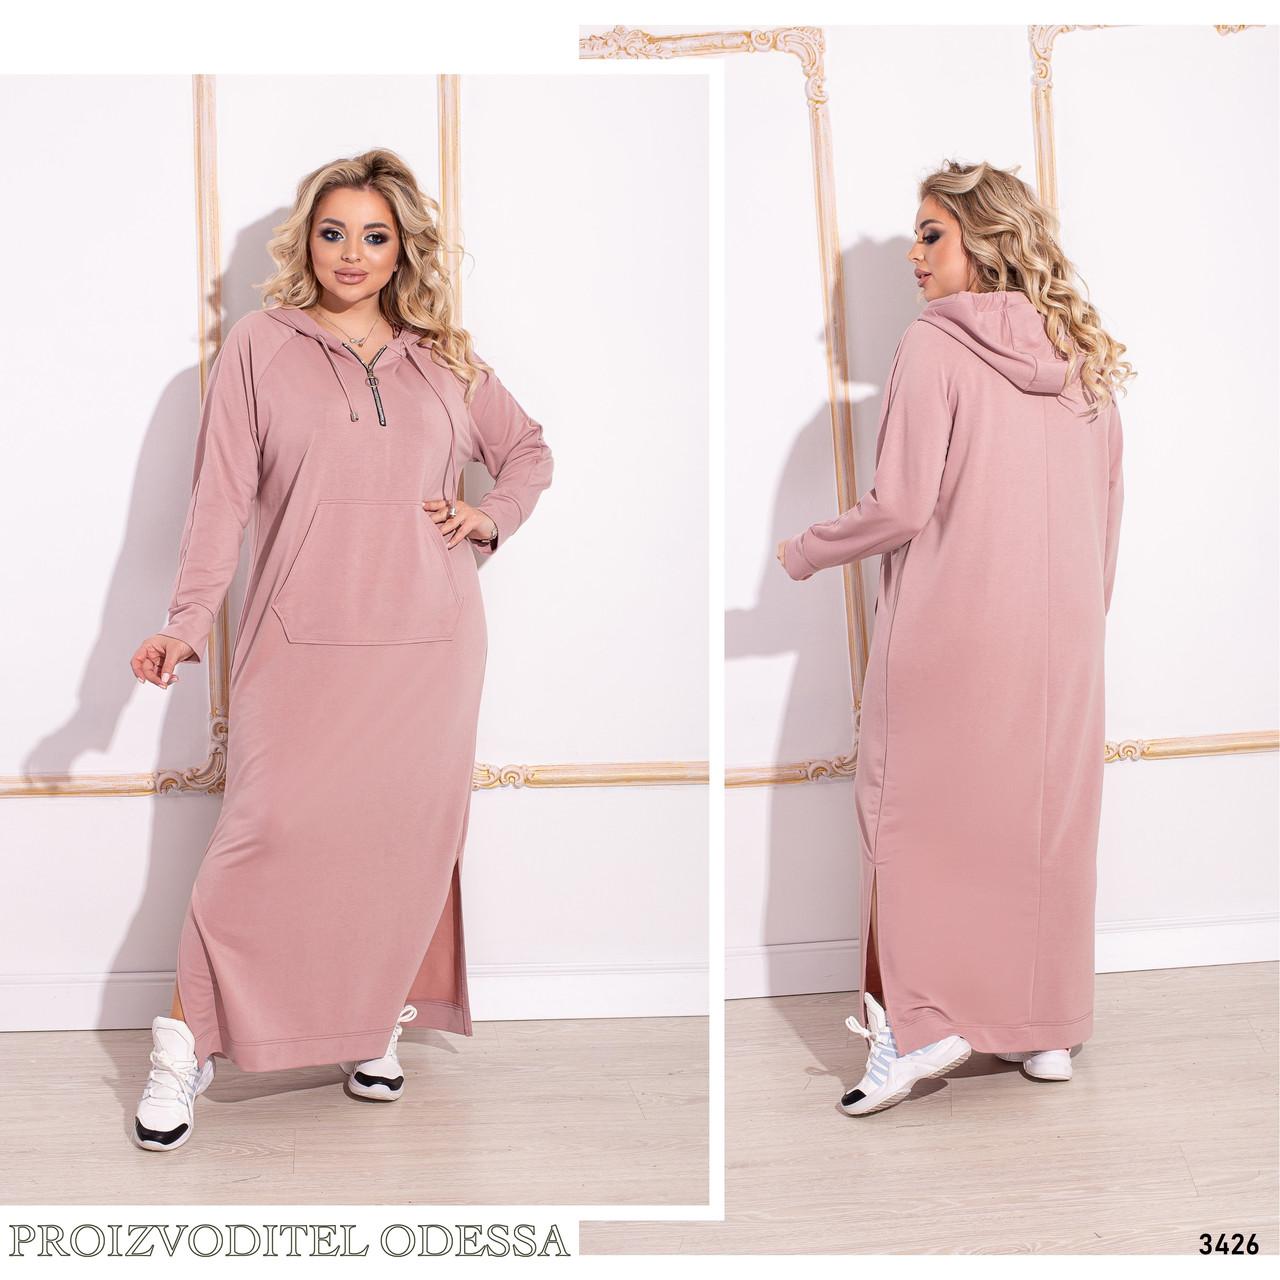 Сукня вільного фасону спорт стилю довге двунитка48-50,52-54,56-58,60-62,64-66